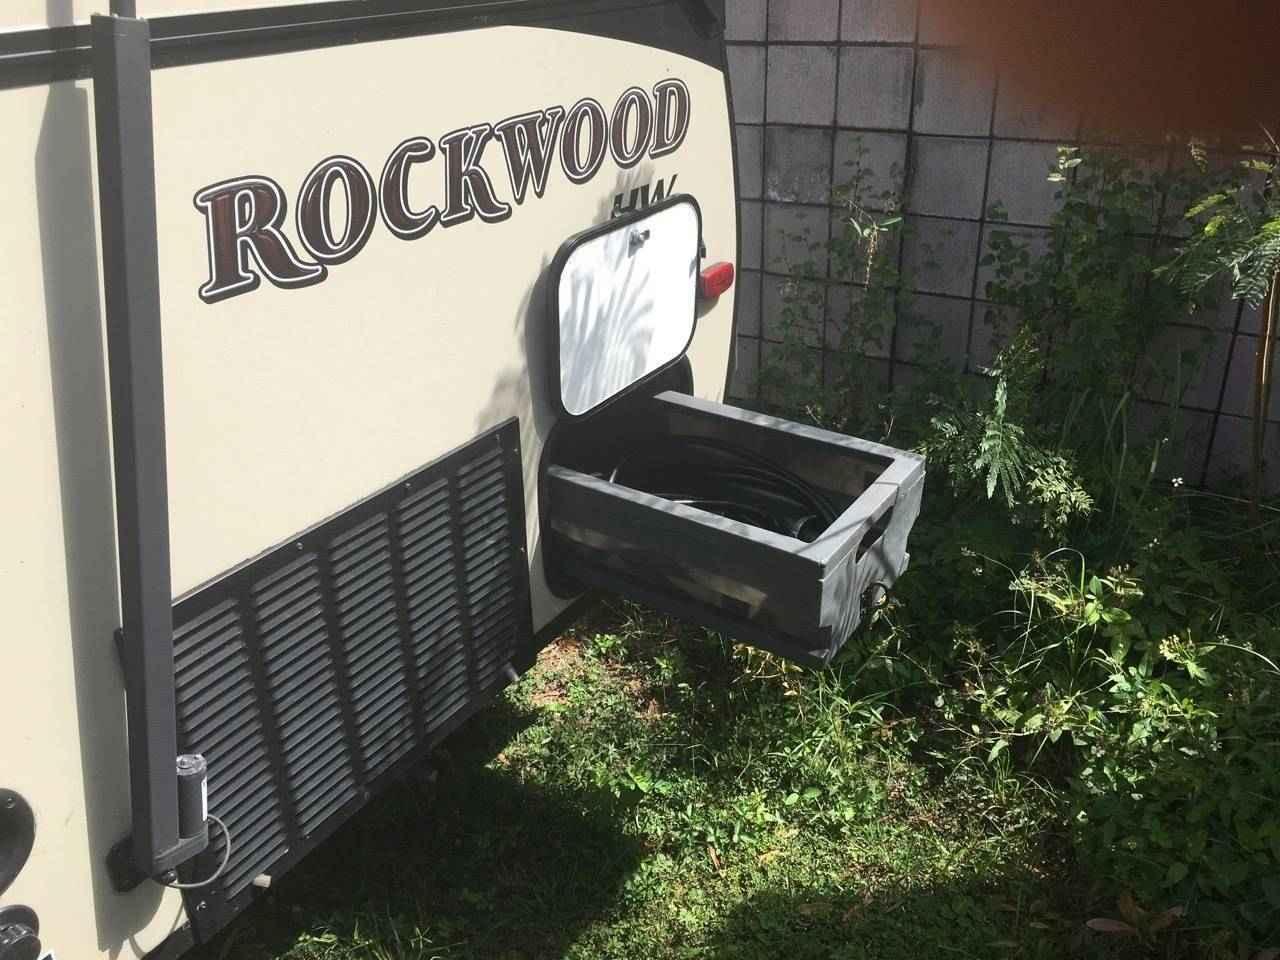 2016 Used Forest River Rockwood A214hw Pop Up Camper In